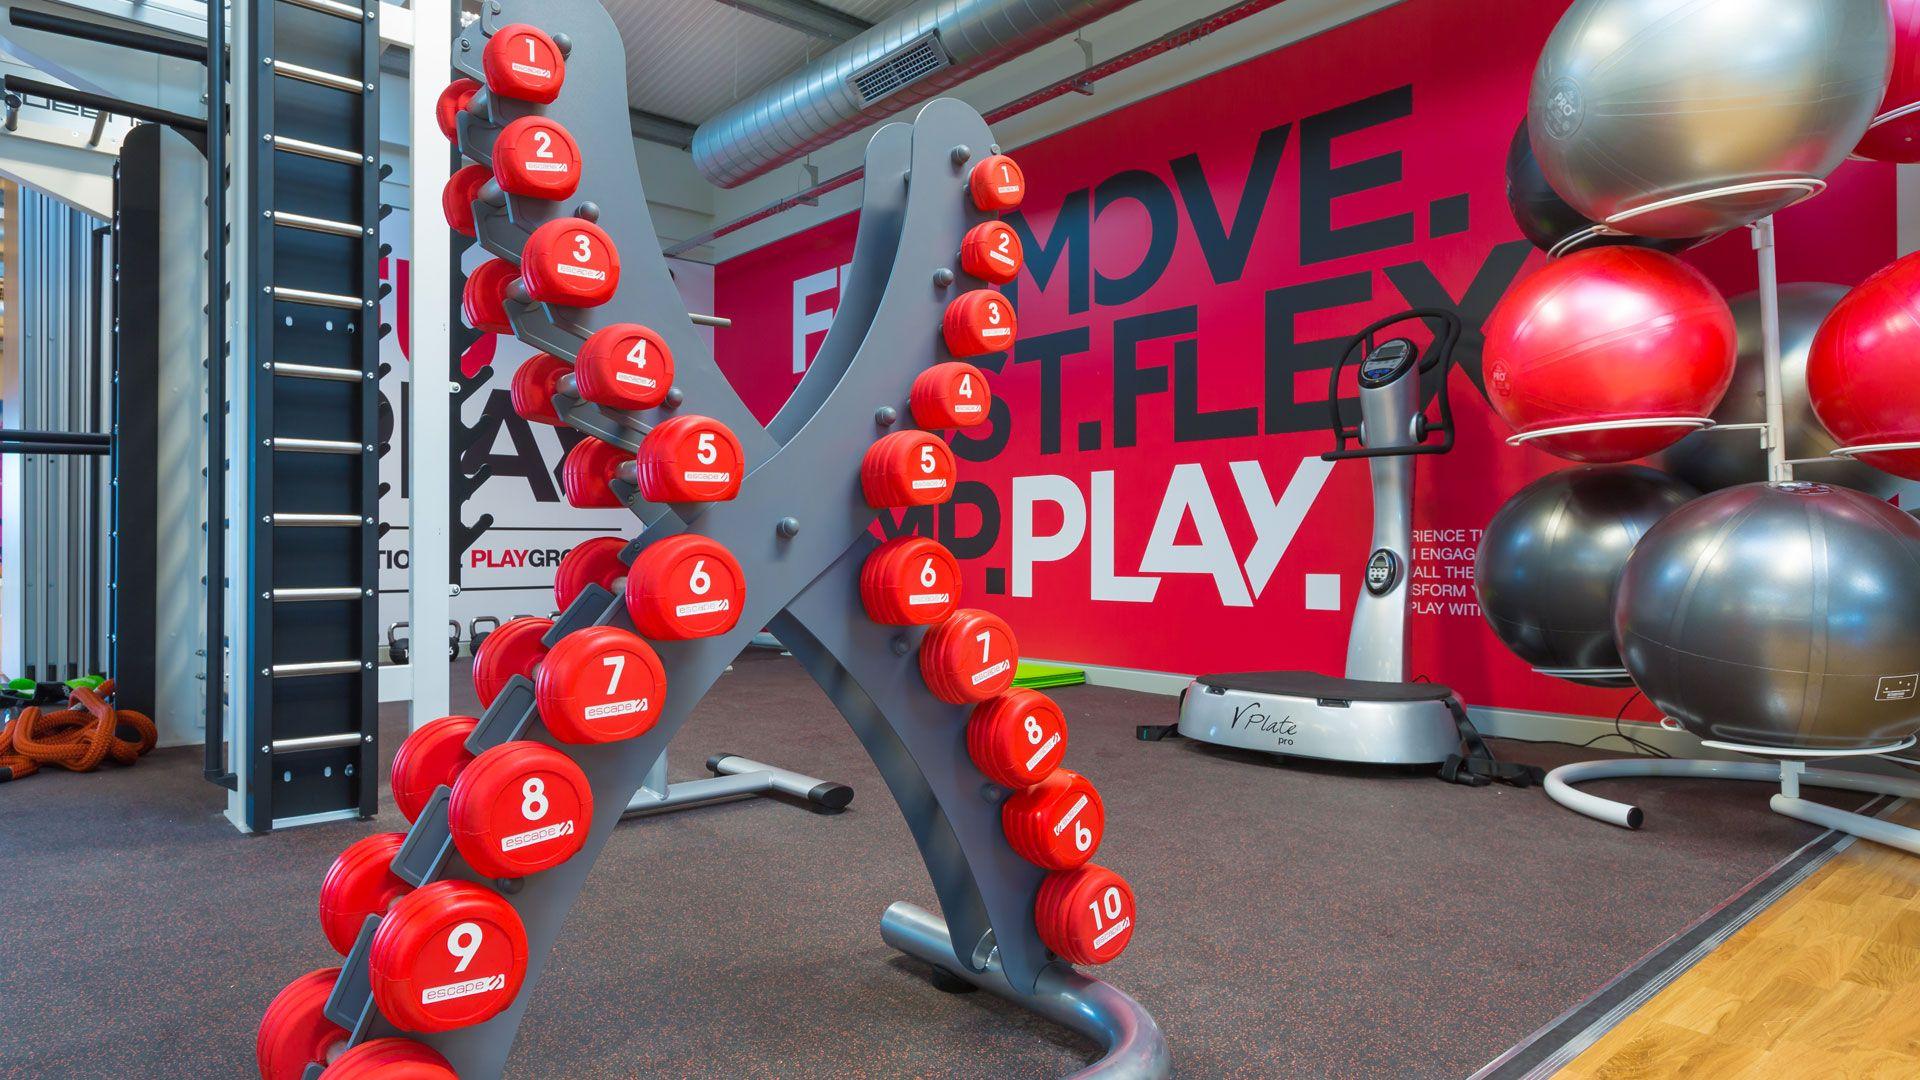 Gallery Lifestyle Fitness Gym Organization Ideas Fitness Support Gym Organizer